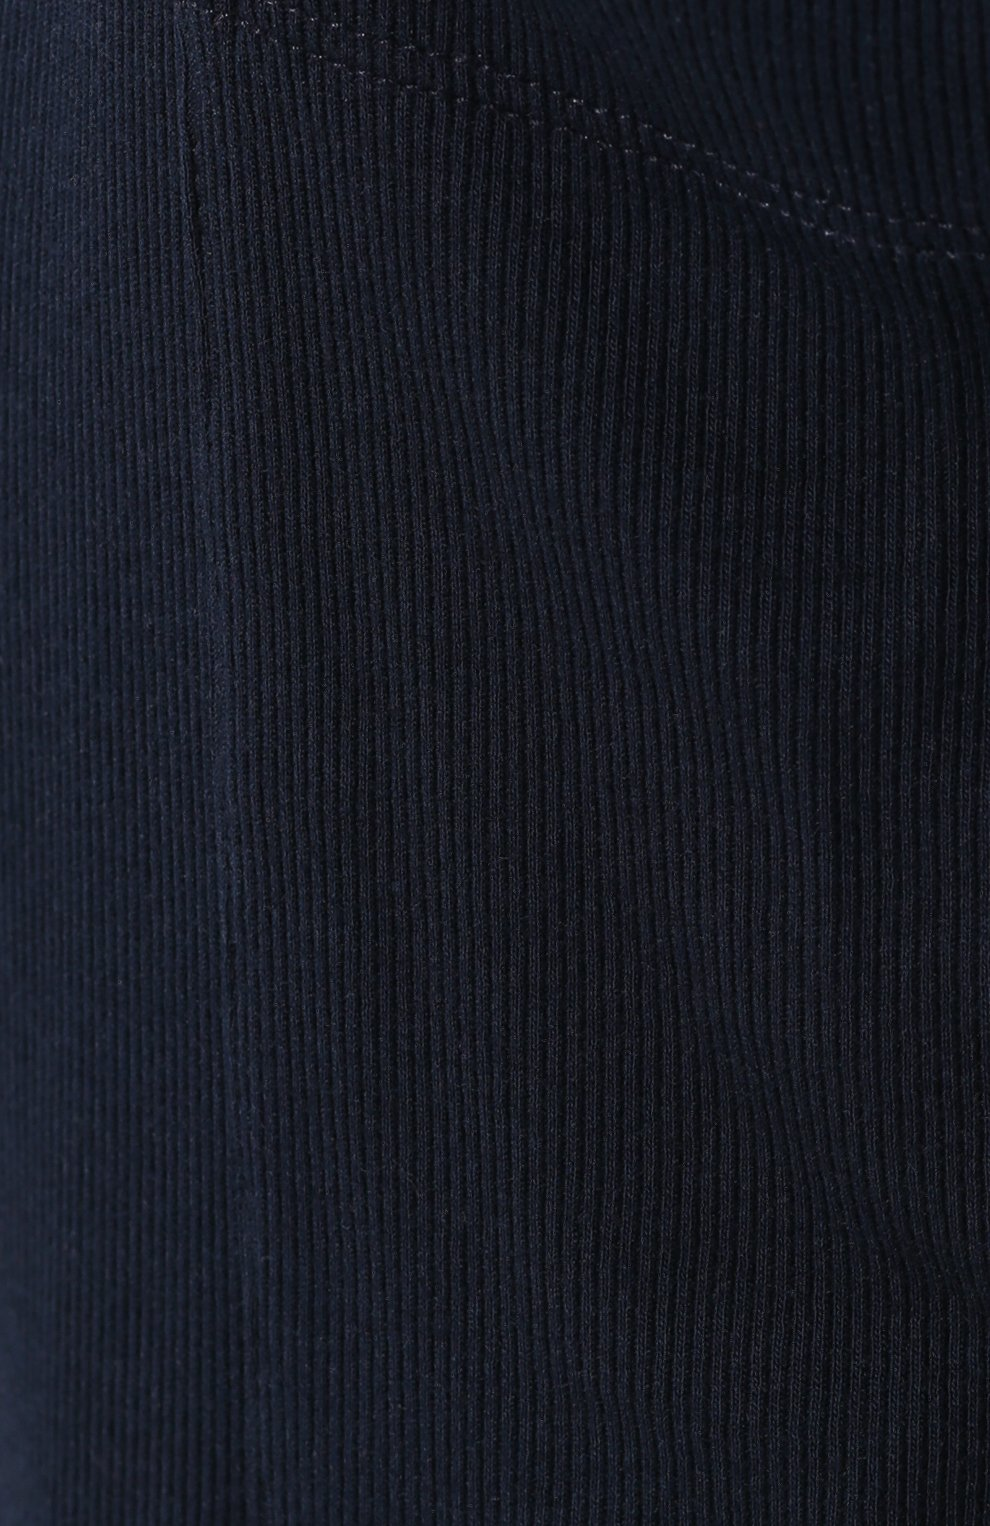 Комбинезон Skin темно-синее | Фото №5